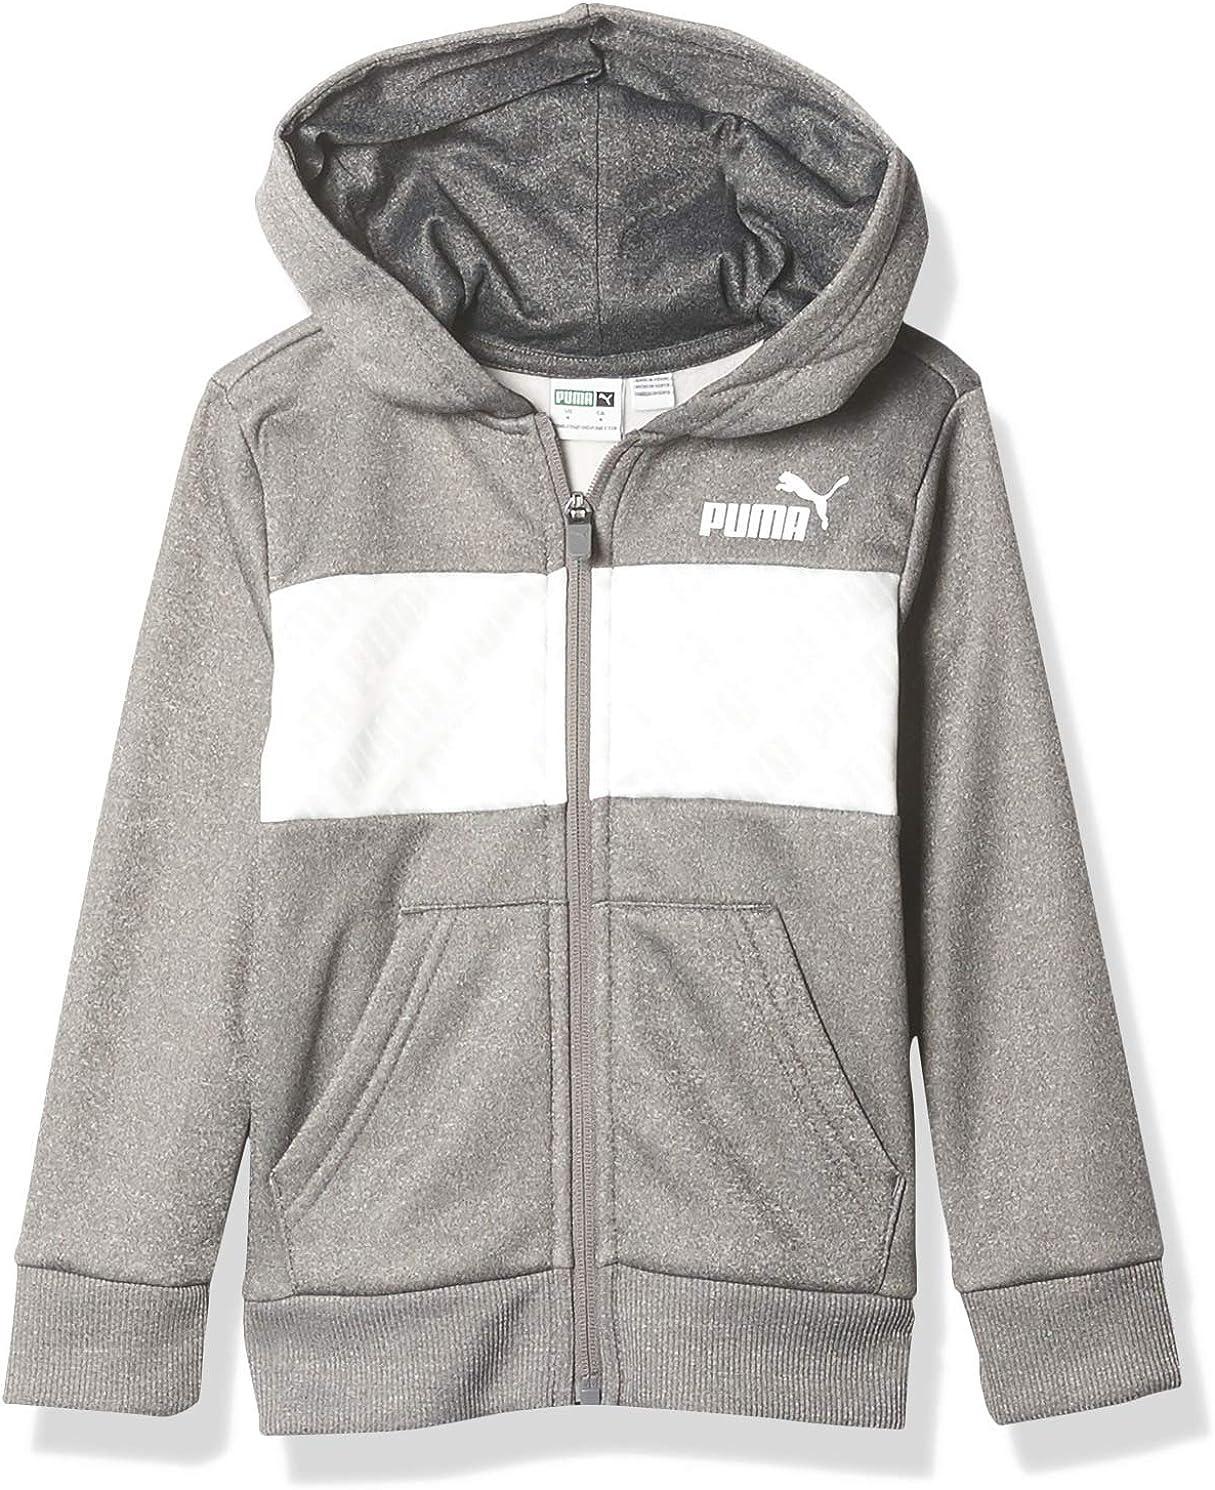 PUMA Boys' Zip Dallas Popular product Mall Hoodie Up